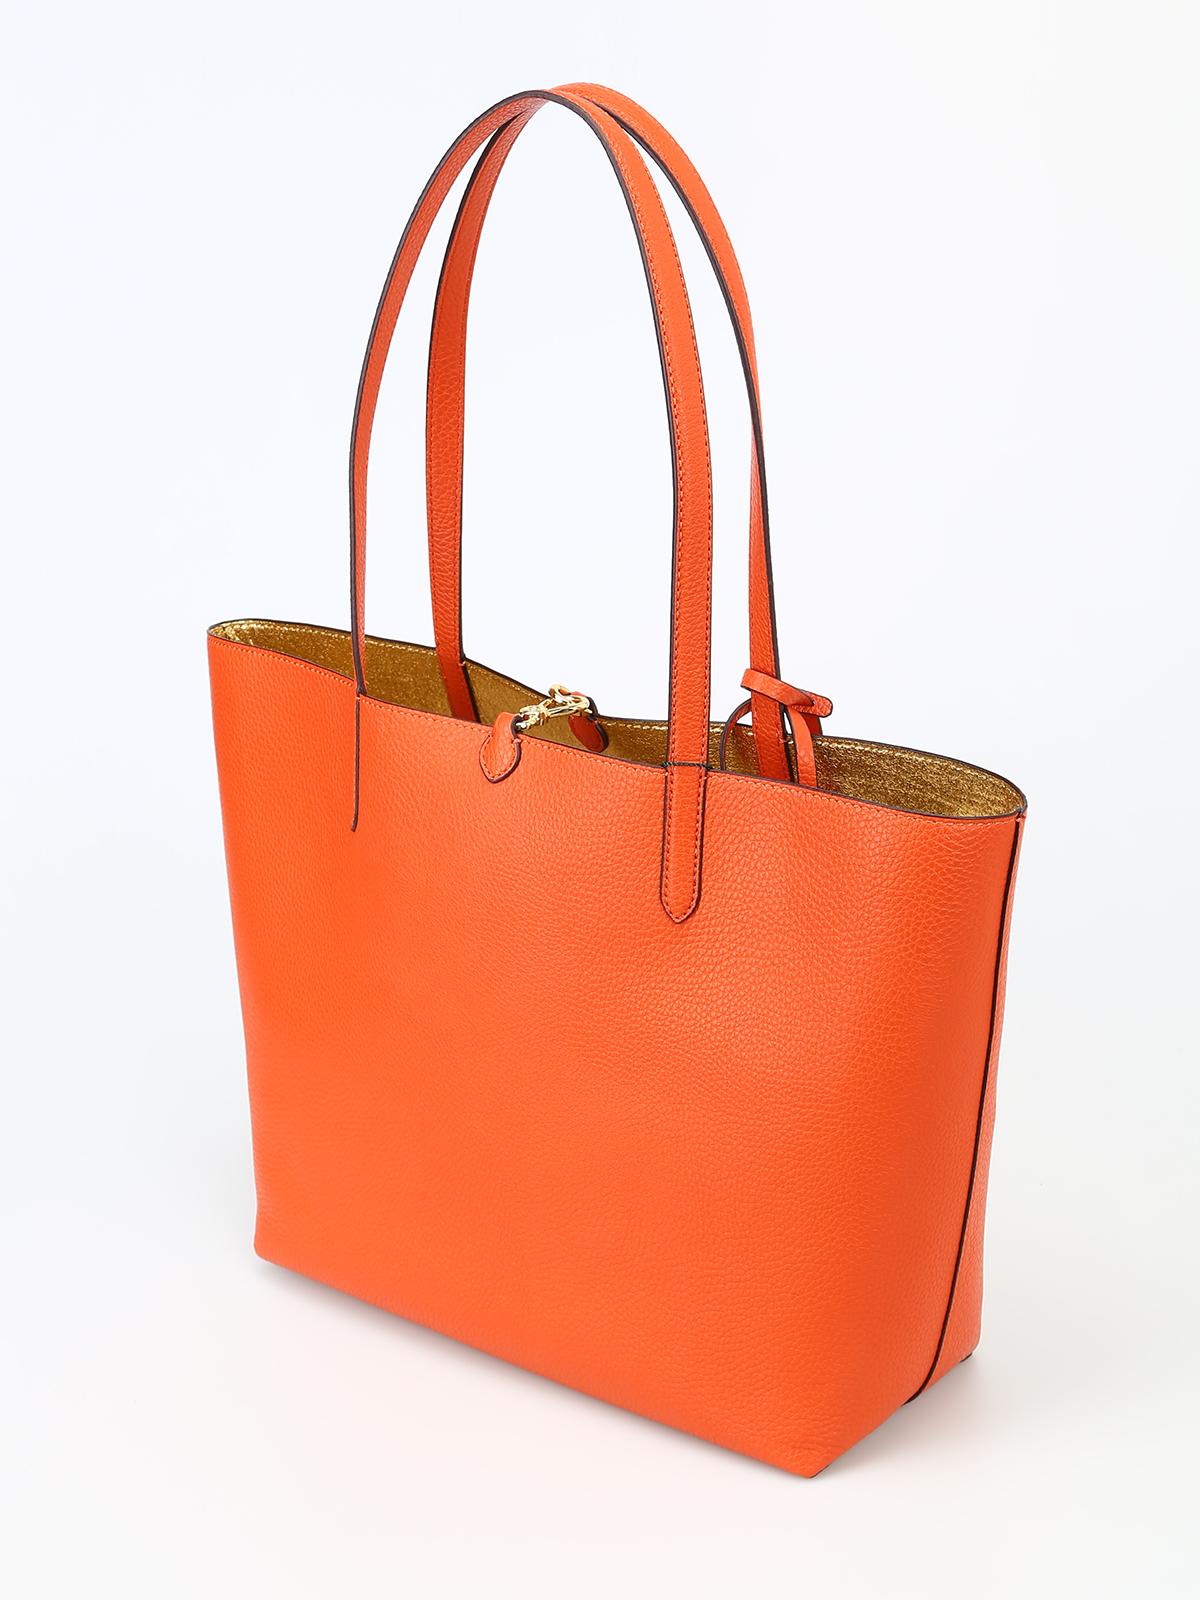 5fe0a286b4 ... iKRIX RALPH LAUREN  totes bags - Merrimack orange and gold reversible  tote ...